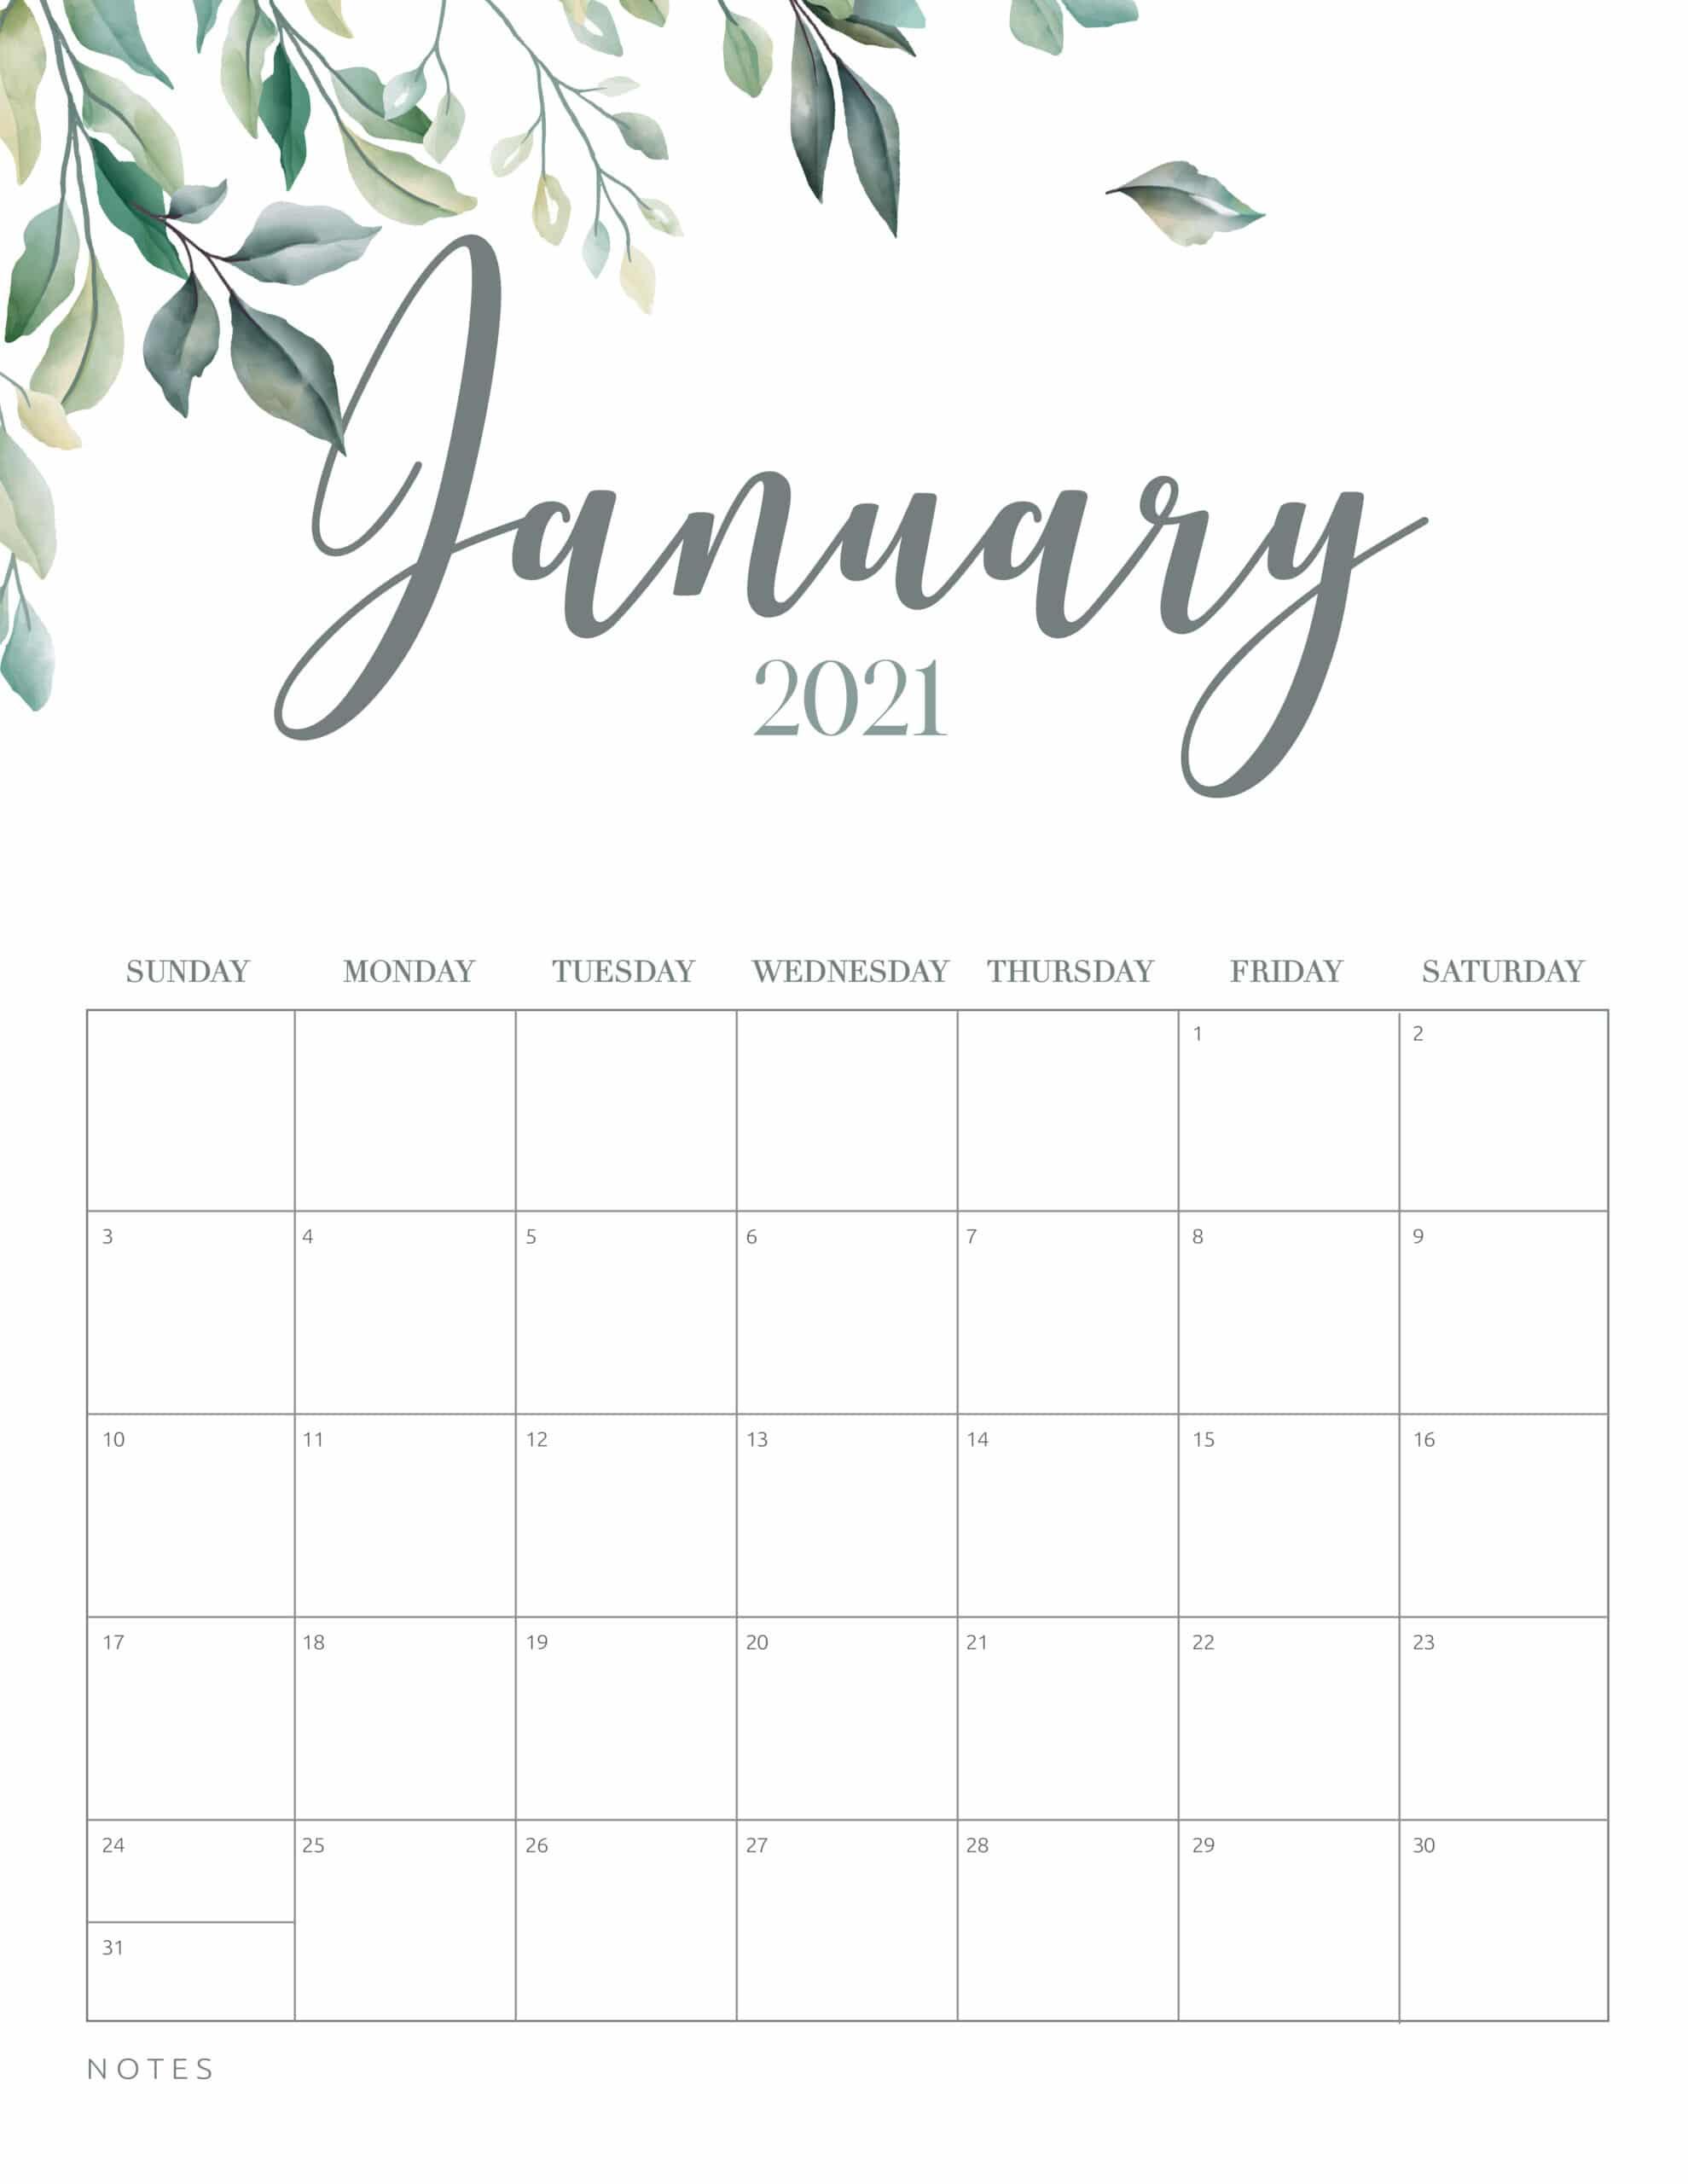 Free Printable 2021 Calendar Botanical Style - World Of